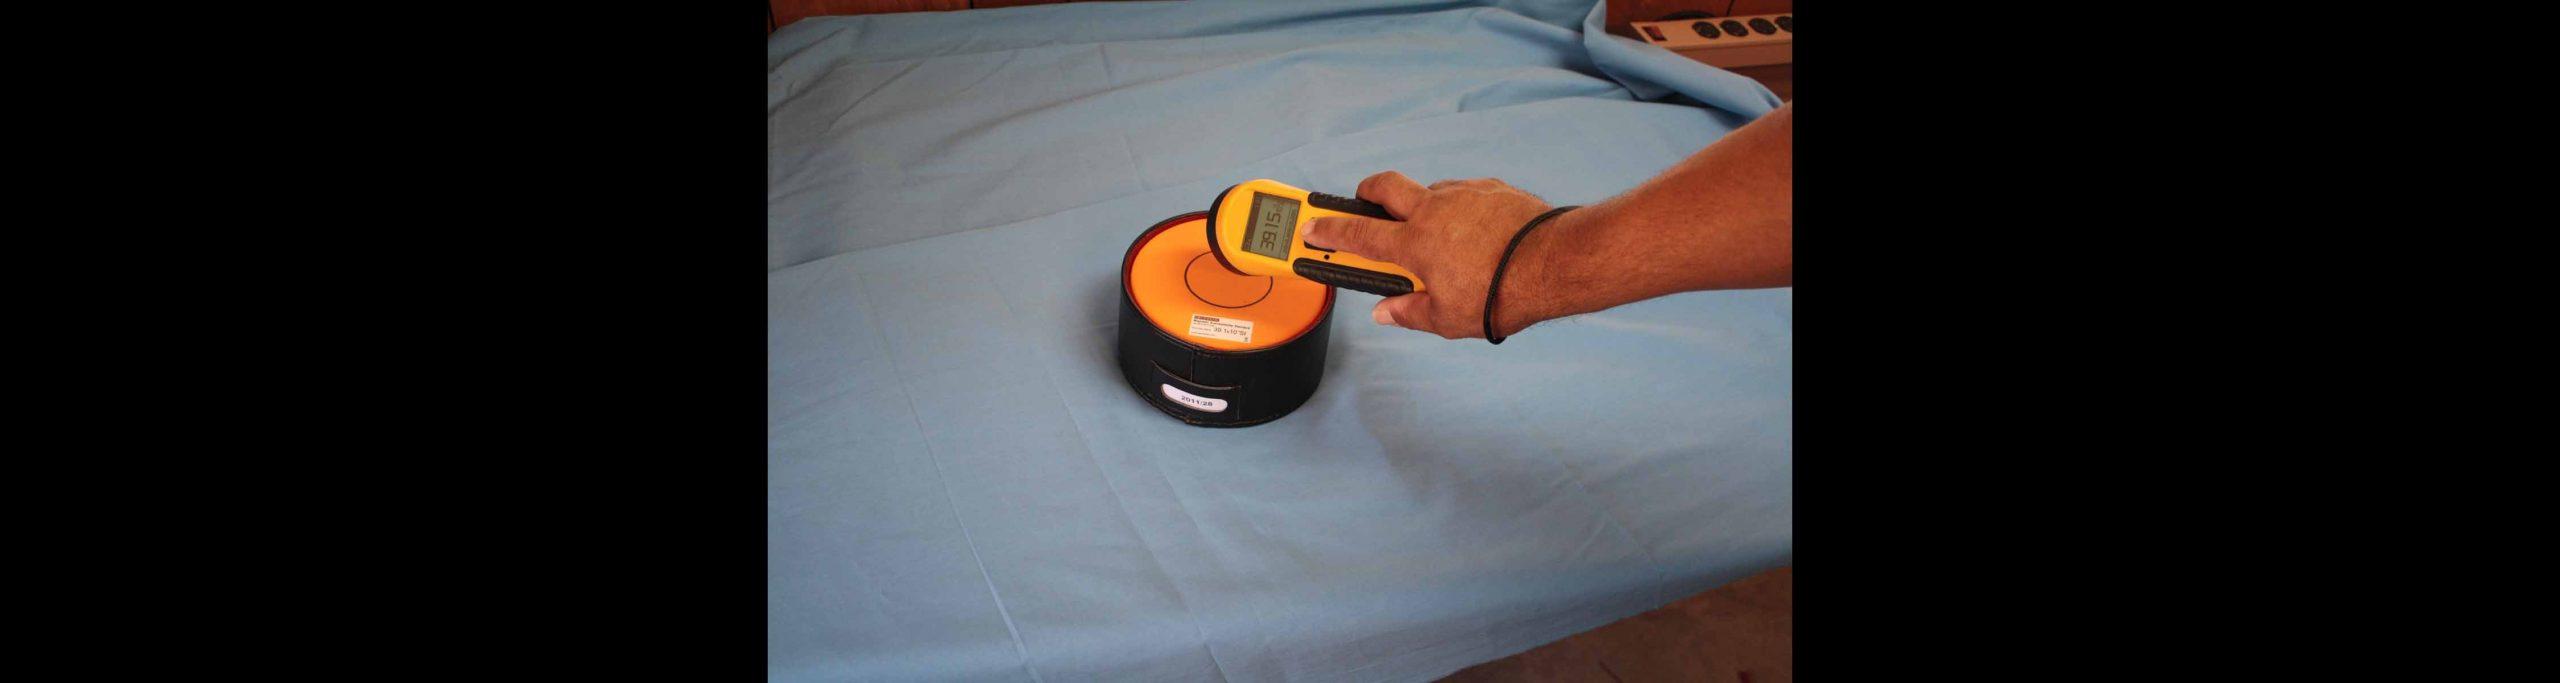 Magnetic Susceptibility Meter Terraplus KT10